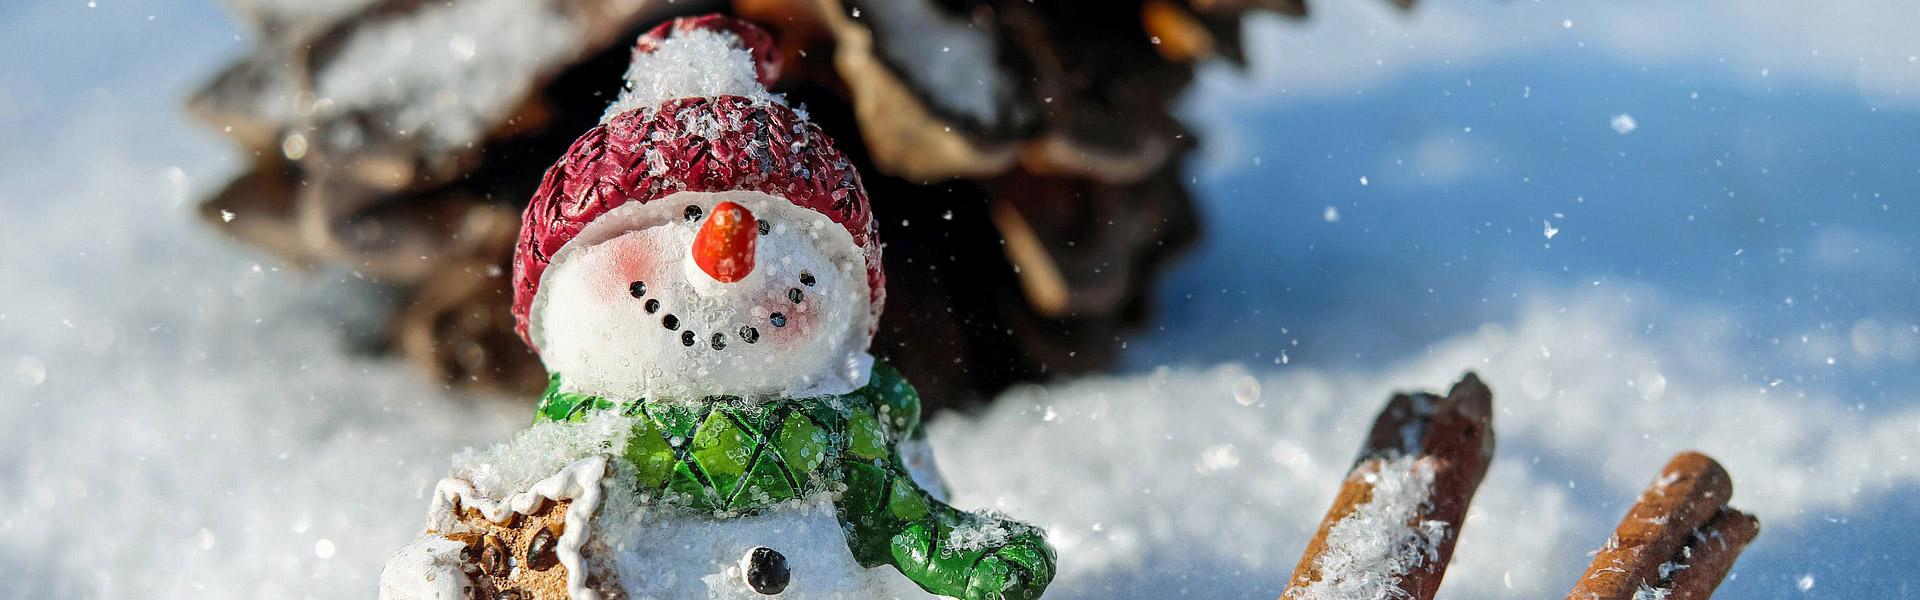 sneeuwman-vochtadvies